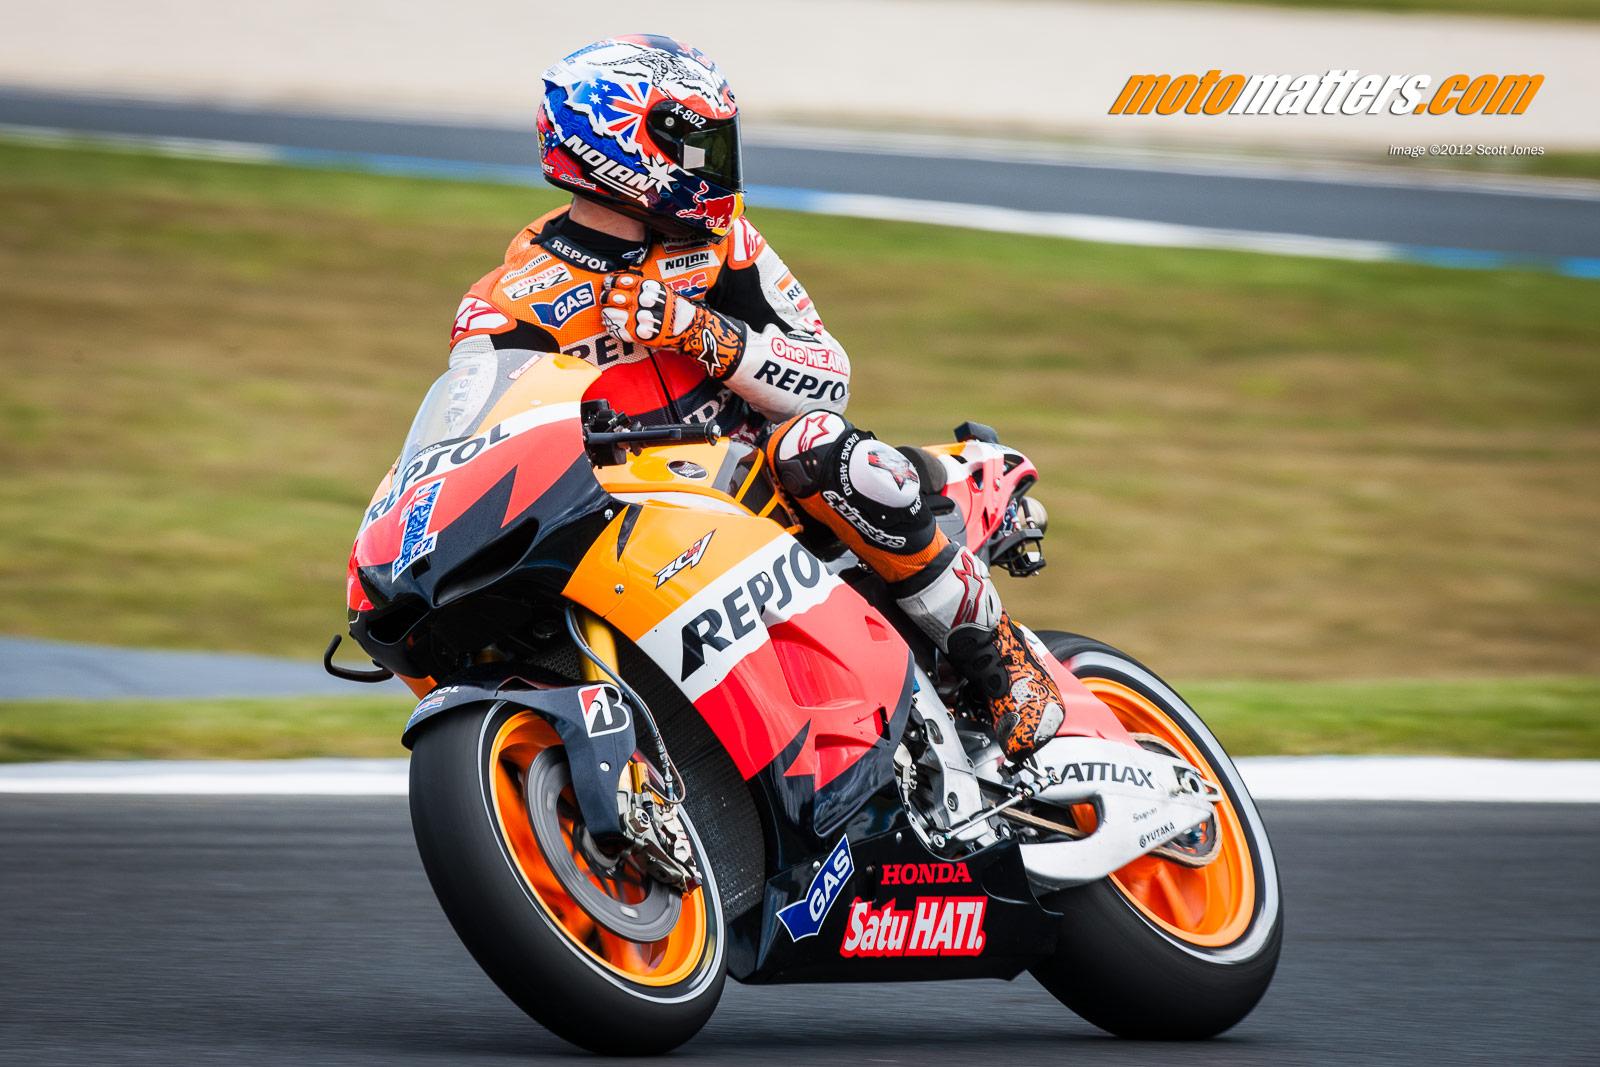 [GP] Phillip Island, 28 octobre 2012 2012-MotoGP-17-Phillip-Island-O